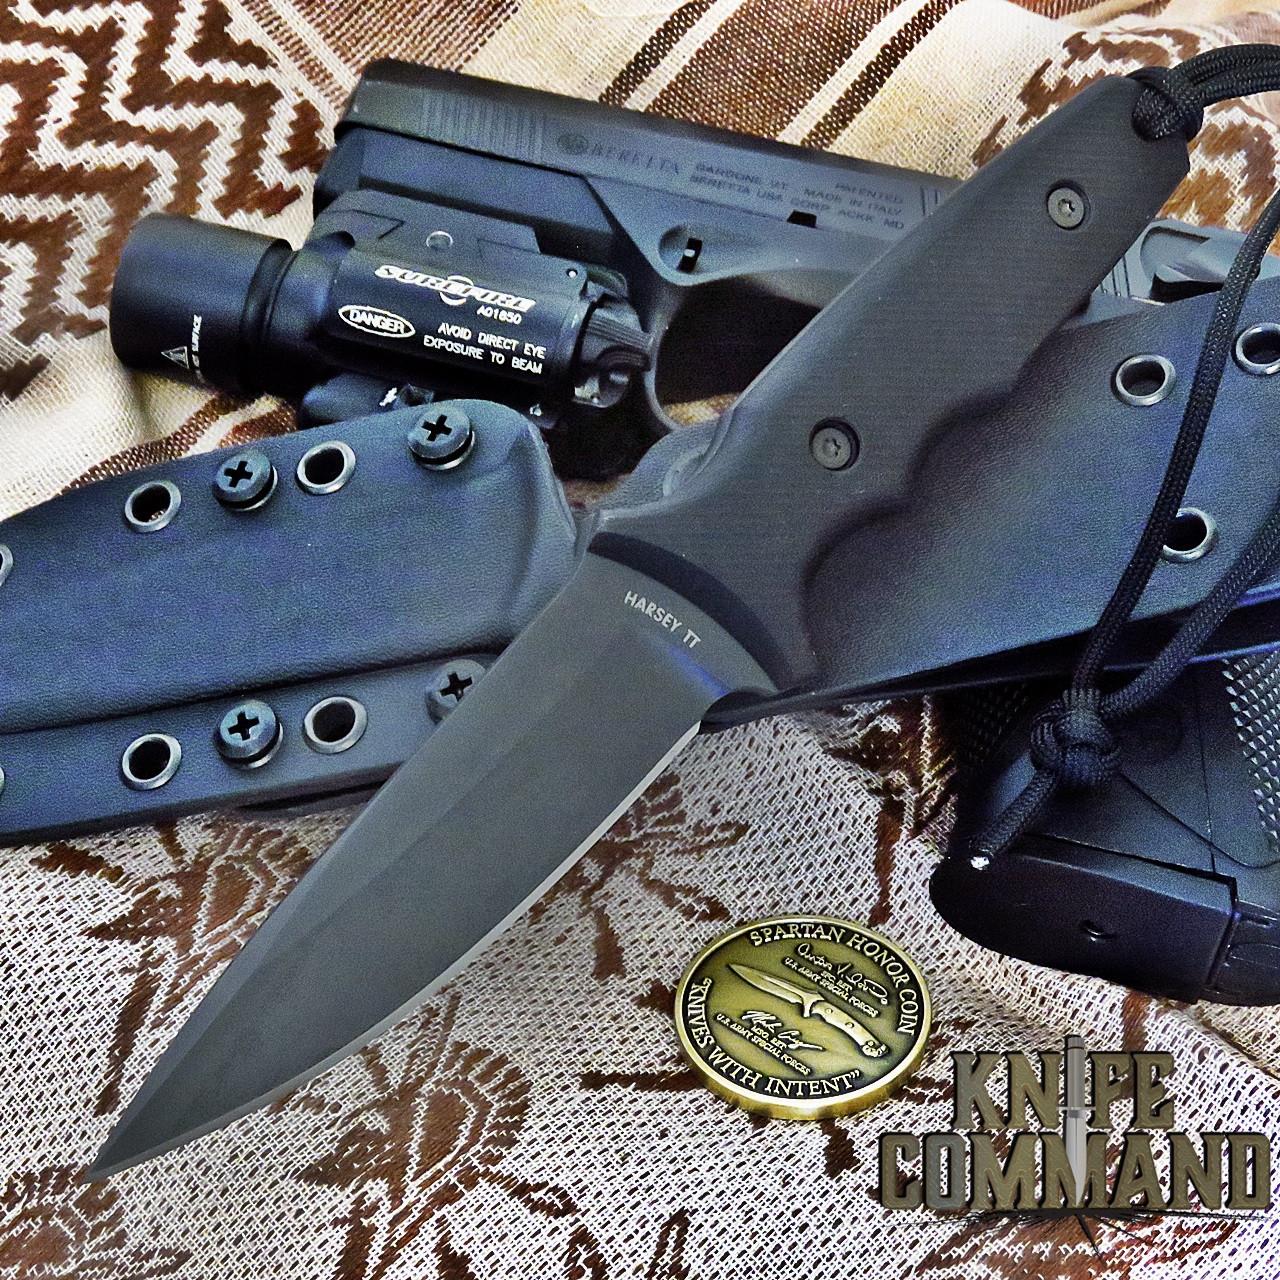 Spartan Blades Harsey Tactical Trout Knife Black / Black Kydex Sheath SB43BKBKKYBK